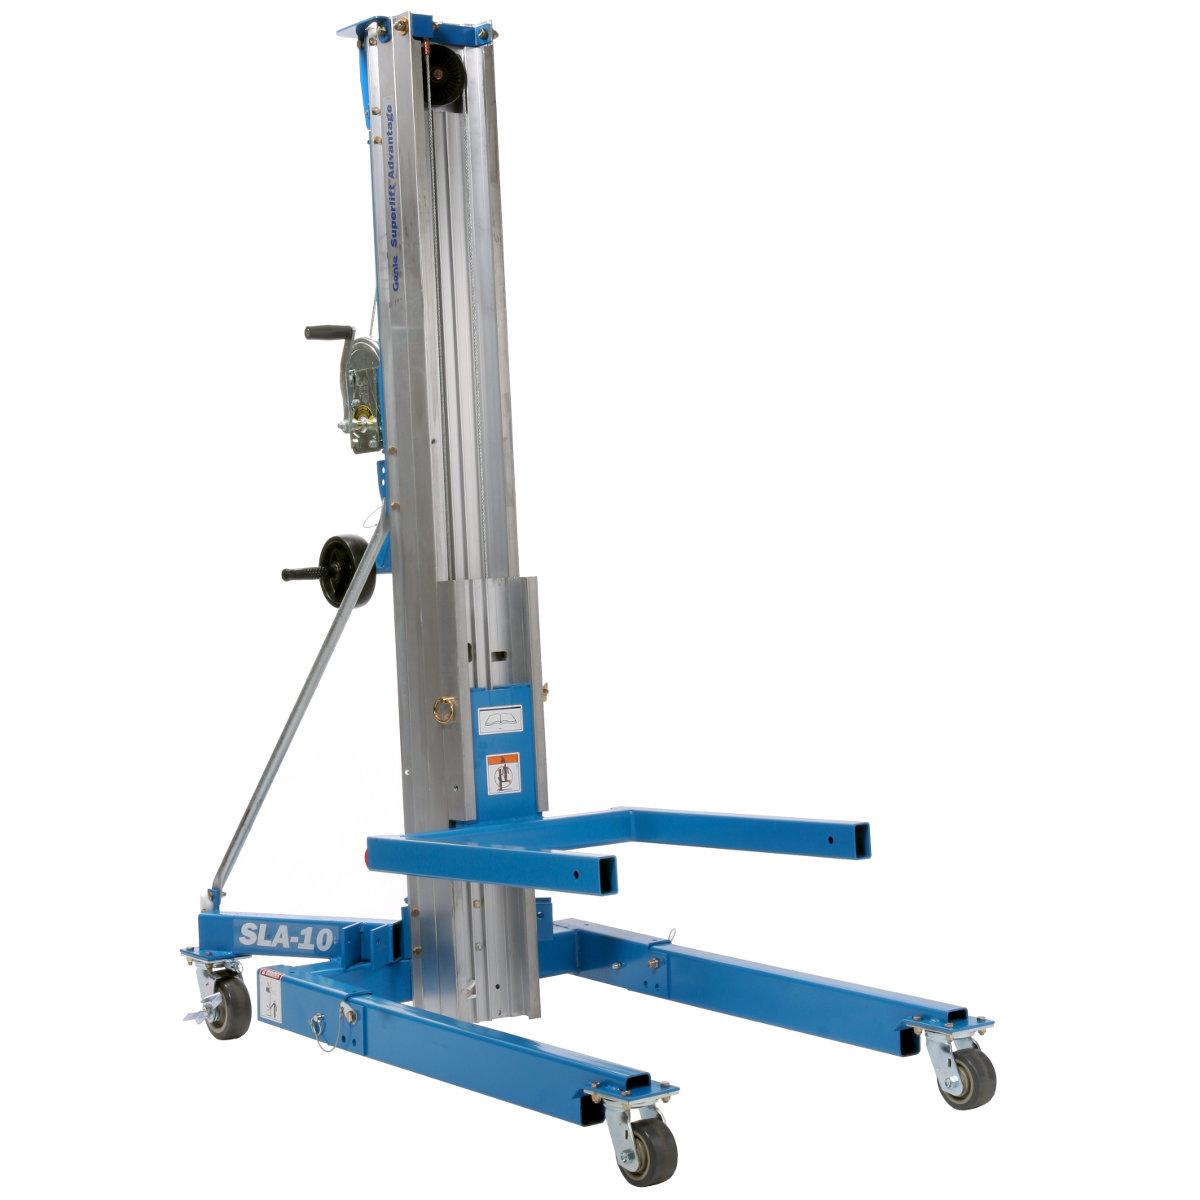 Genie-Superlift-Advantage-SLA10-Tool-Hire.jpg